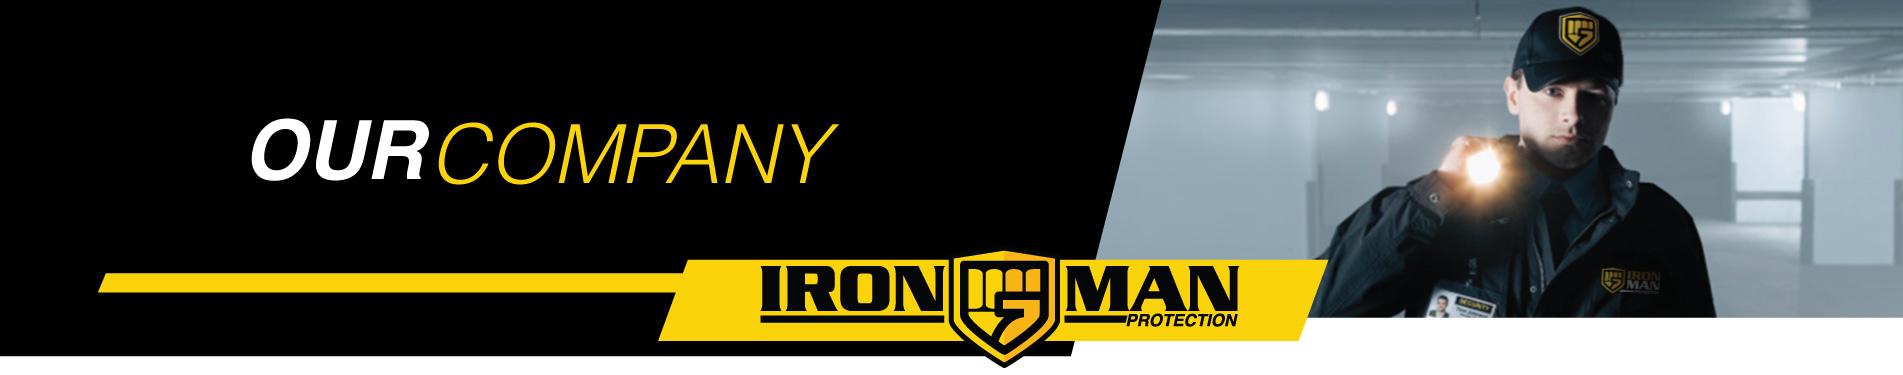 security services Iron Man Protection Houston TX